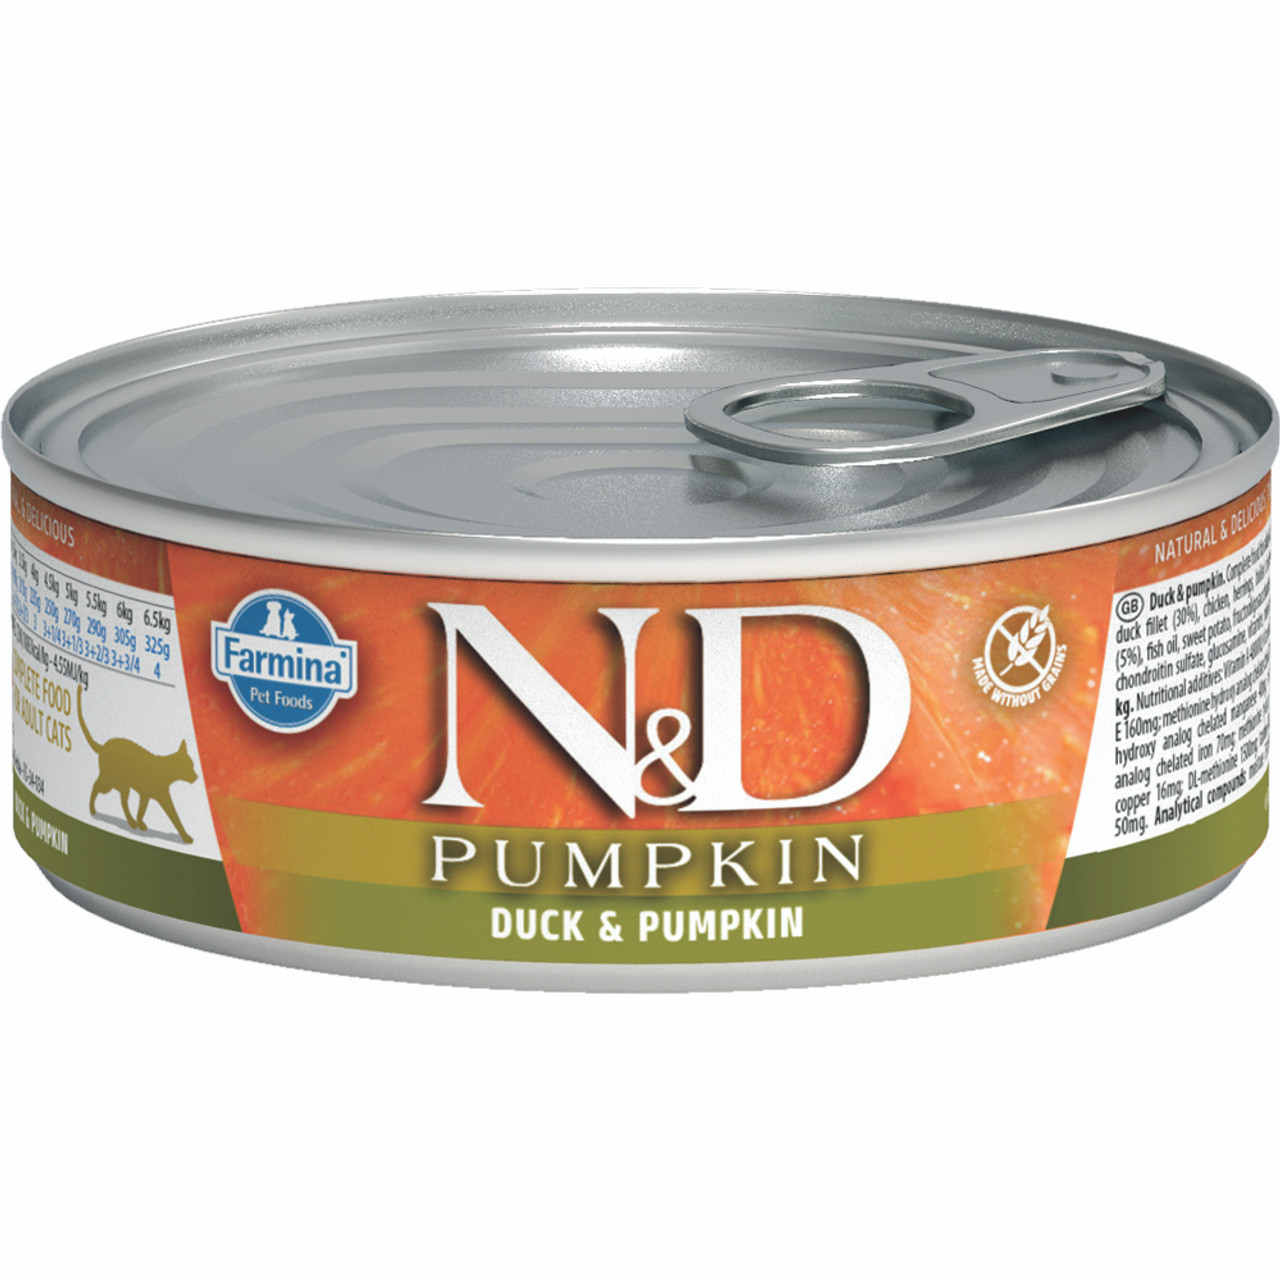 Farmina N&D Pumpkin Duck & Pumpkin Recipe Adult Canned Cat Food